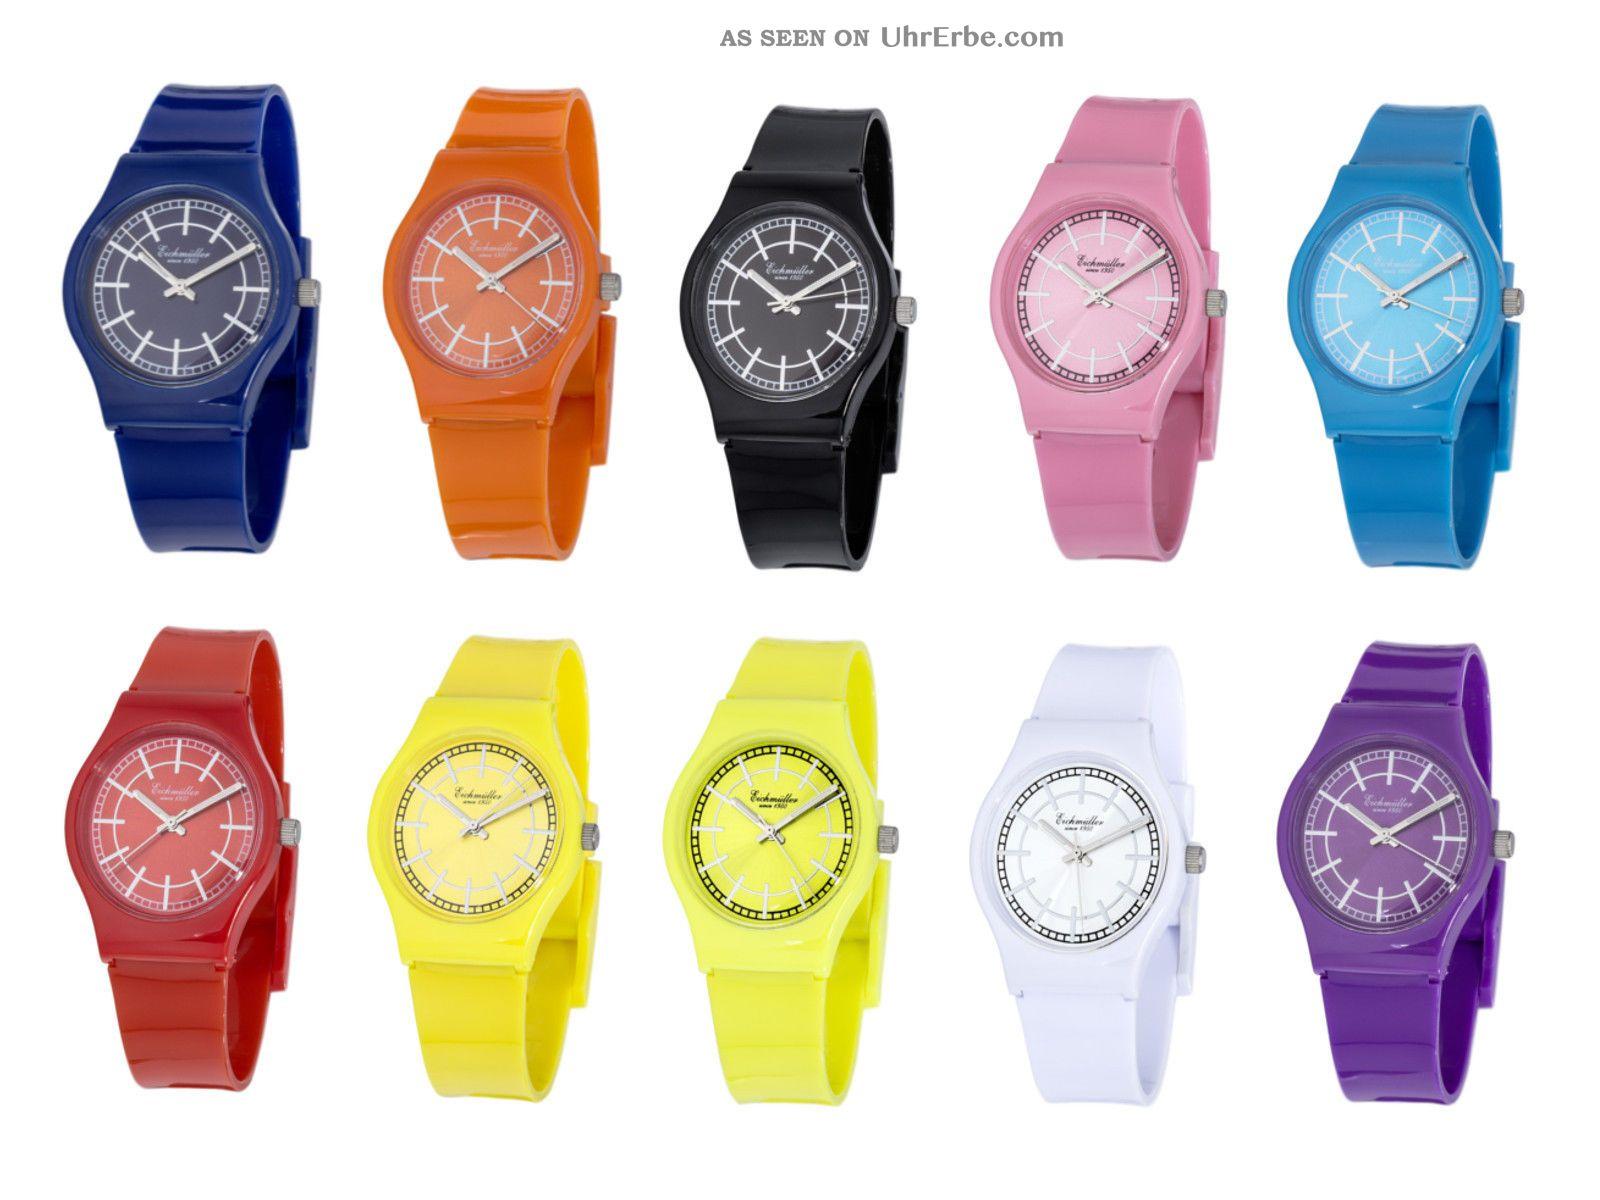 Trend Uhr,  Armband Uhren,  Rot Gelb Blau Lila Orange Weiß Schwarz Rosa Türkis Armbanduhren Bild